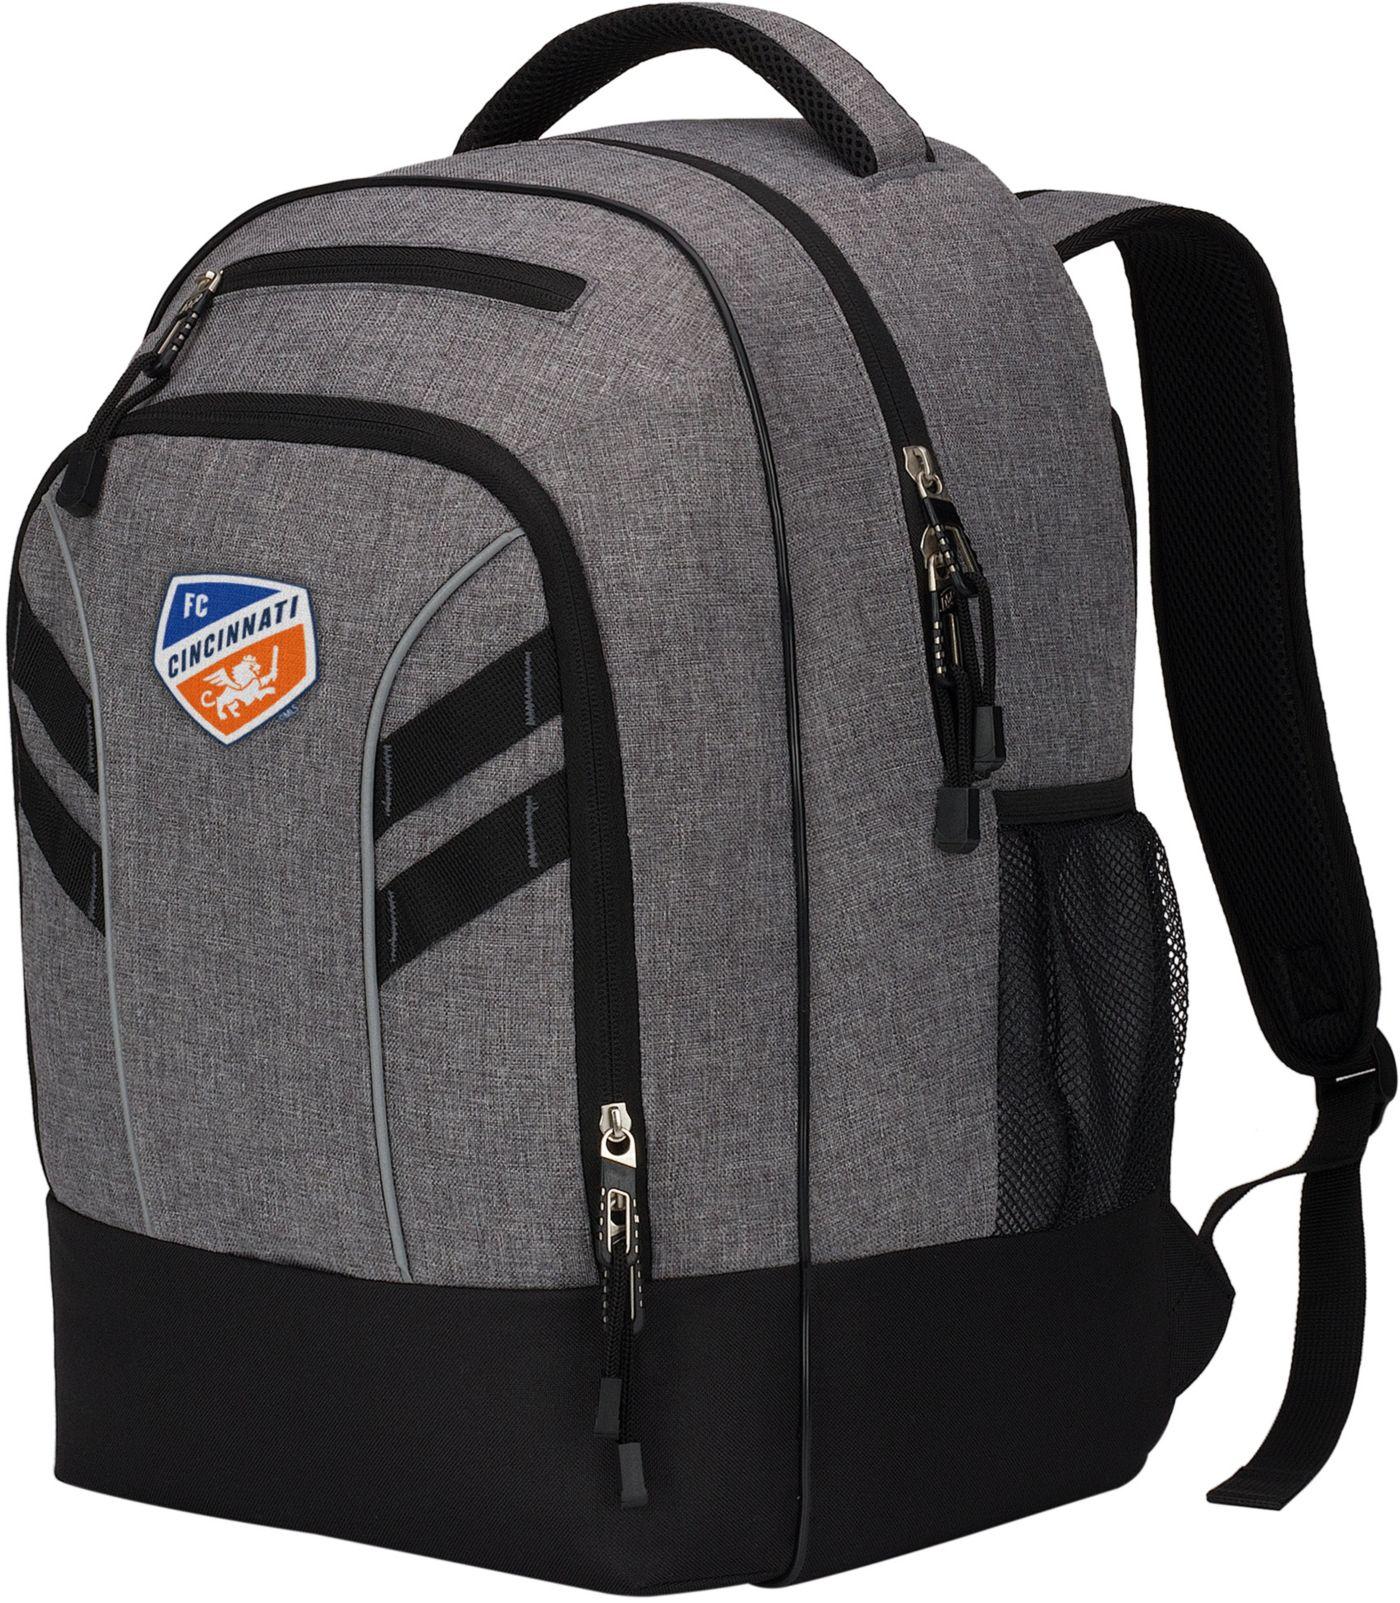 Northwest FC Cincinnati Razor Backpack